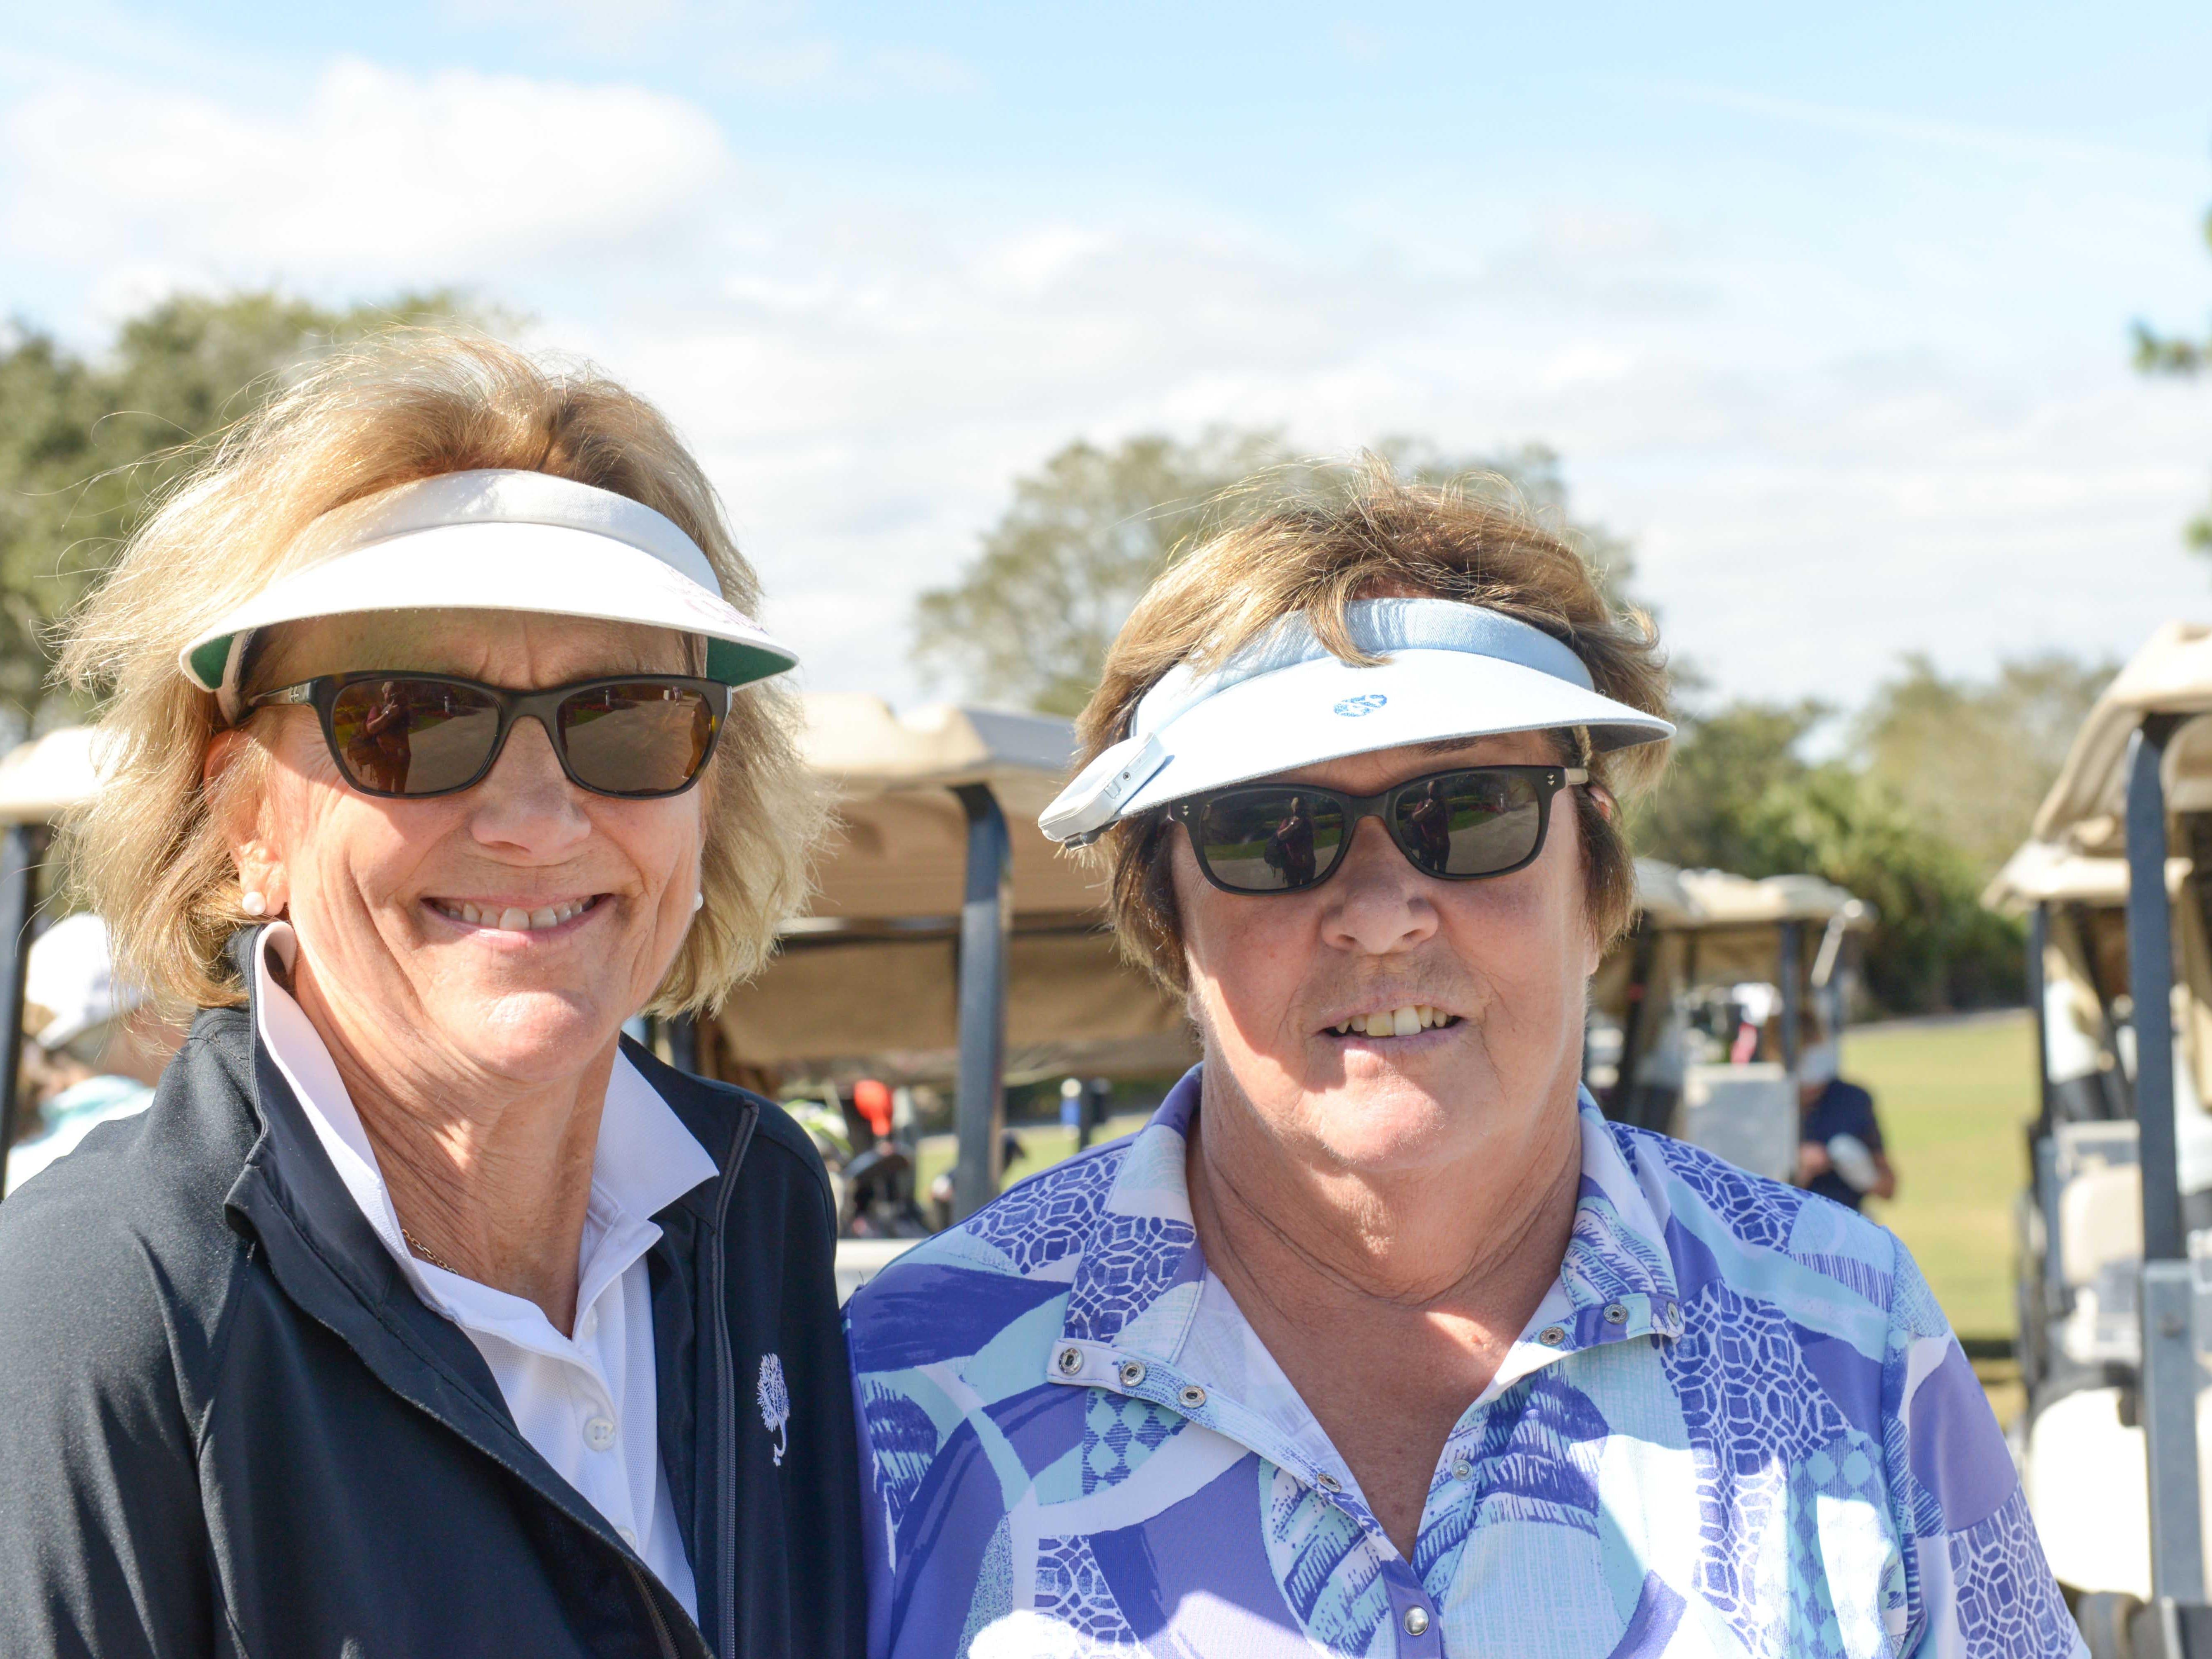 Nancy Jones, left, and Caroline Taylor at Hawk's Nest Golf Club for the Big Brothers Big Sisters Golf Tournament on Feb. 4.